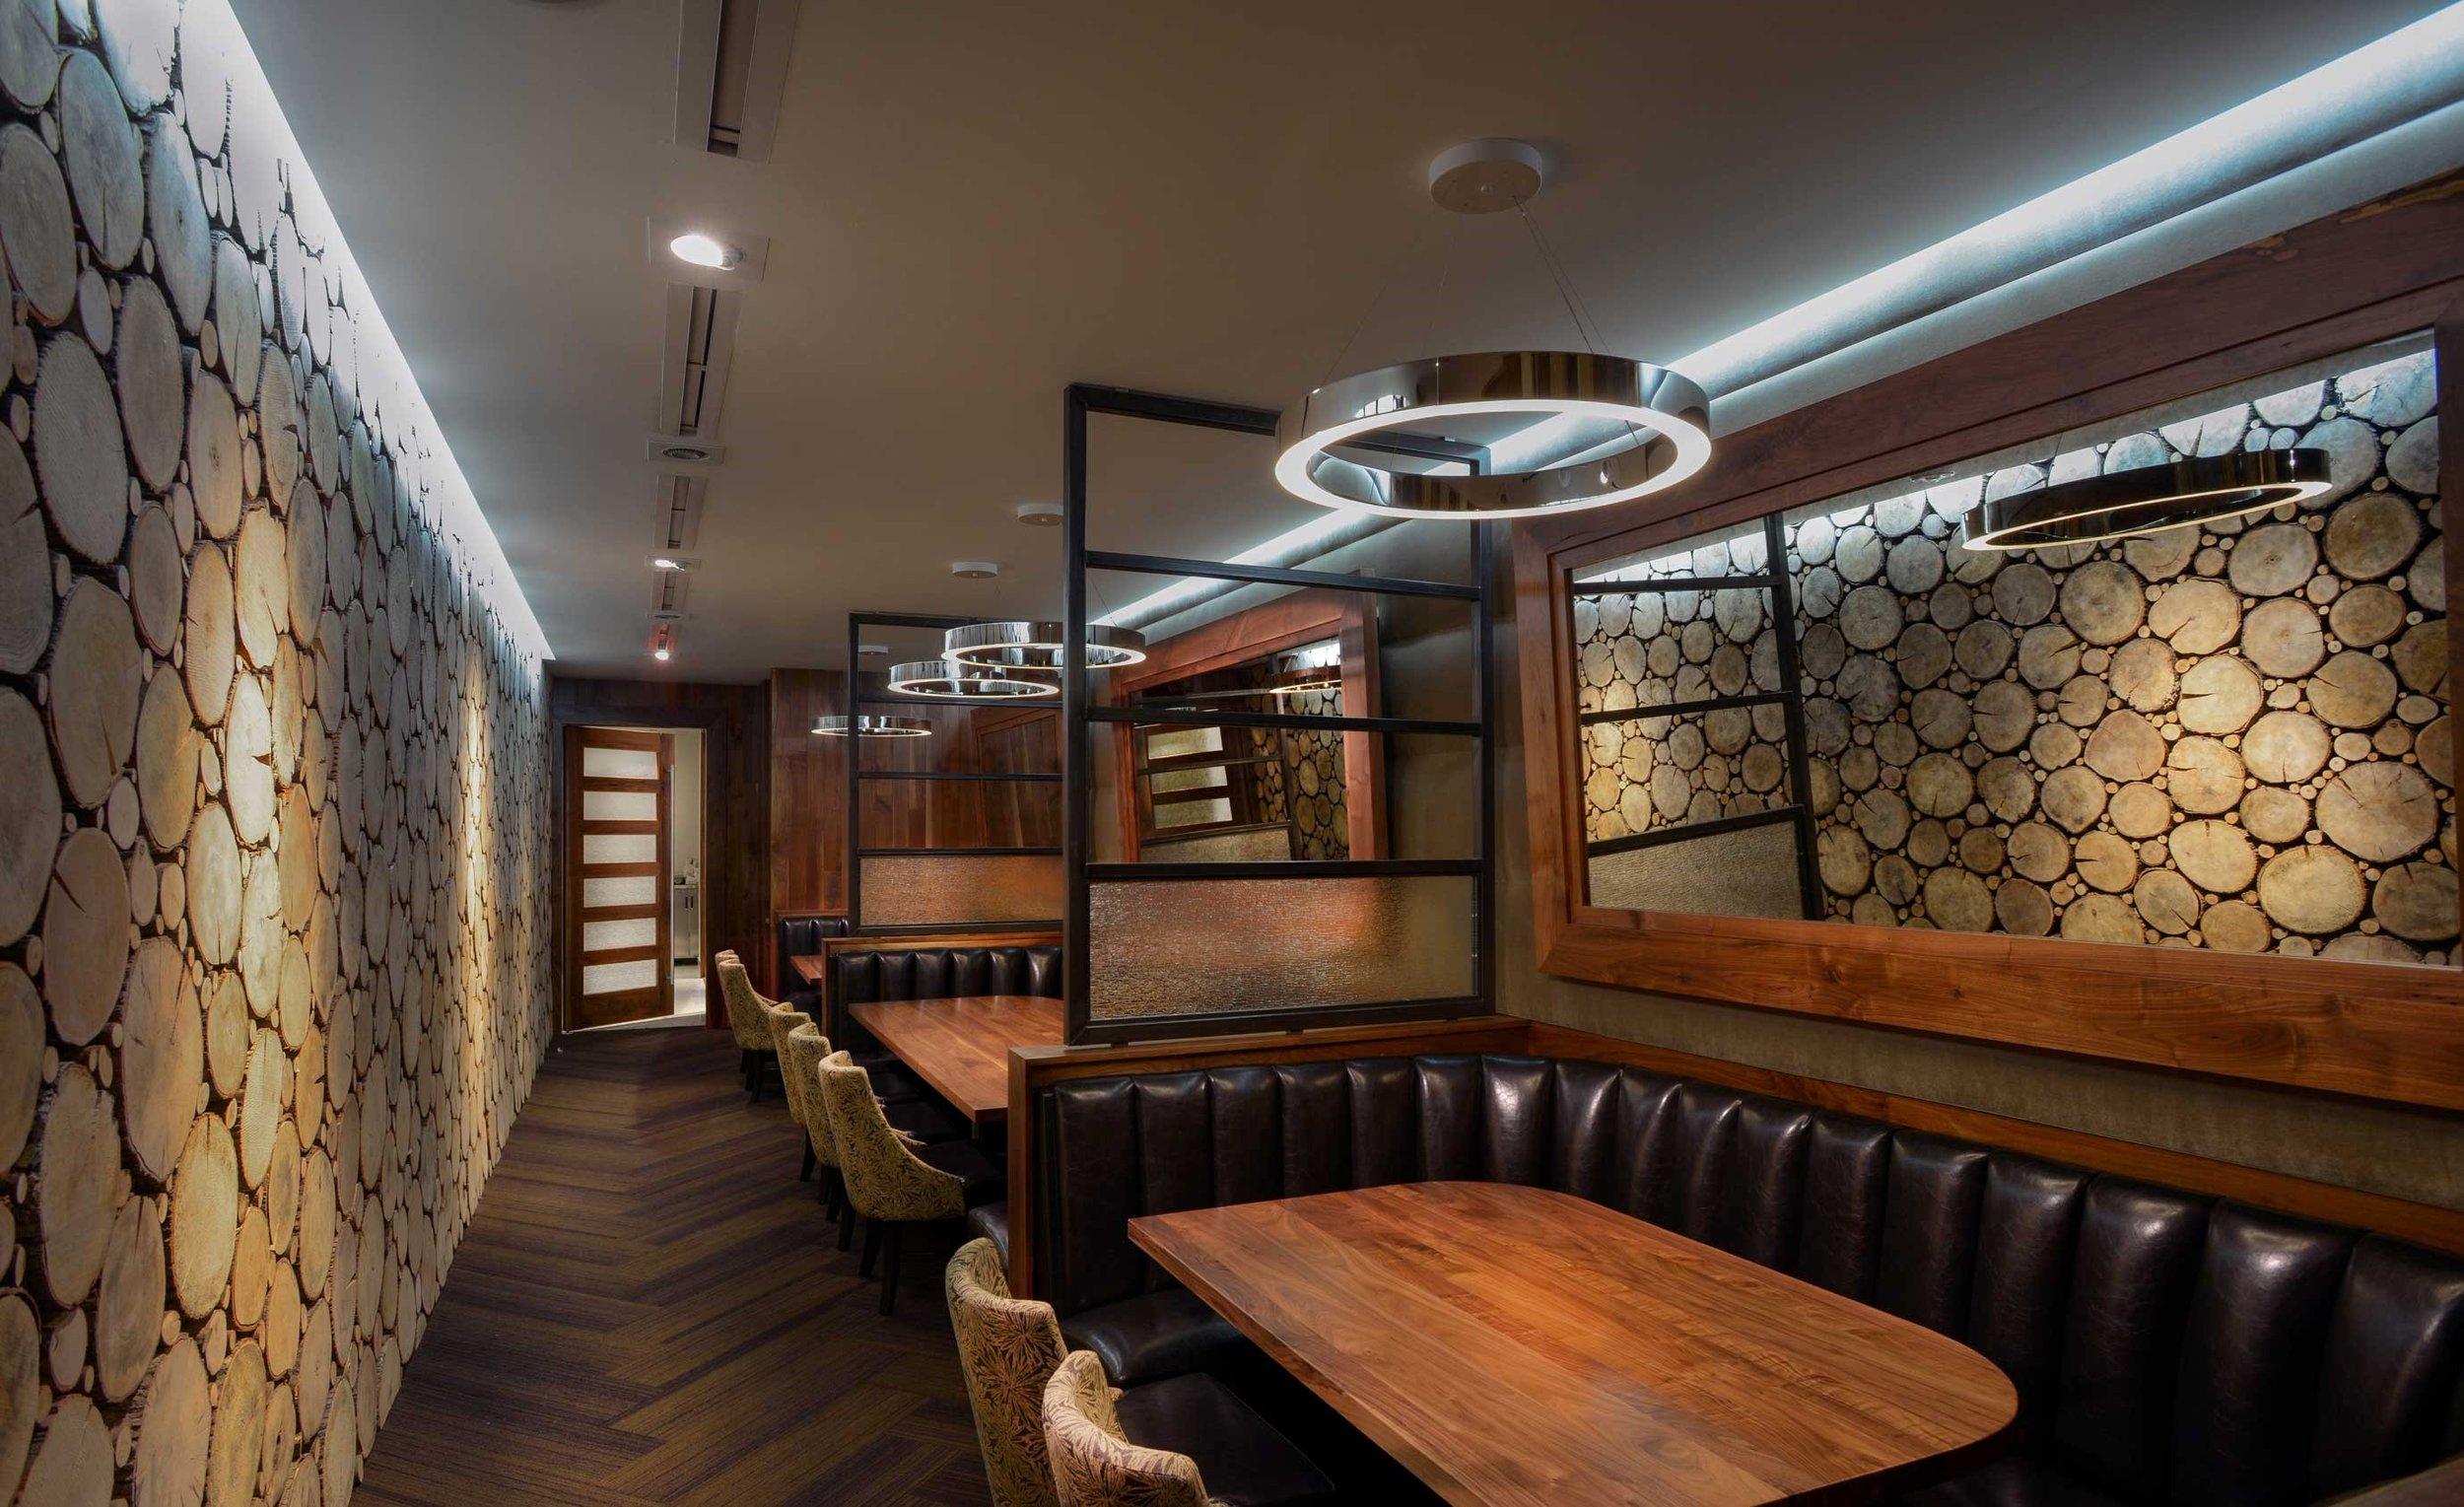 studio-saint-bars-and-restaurants-boveda-washington-dc-9